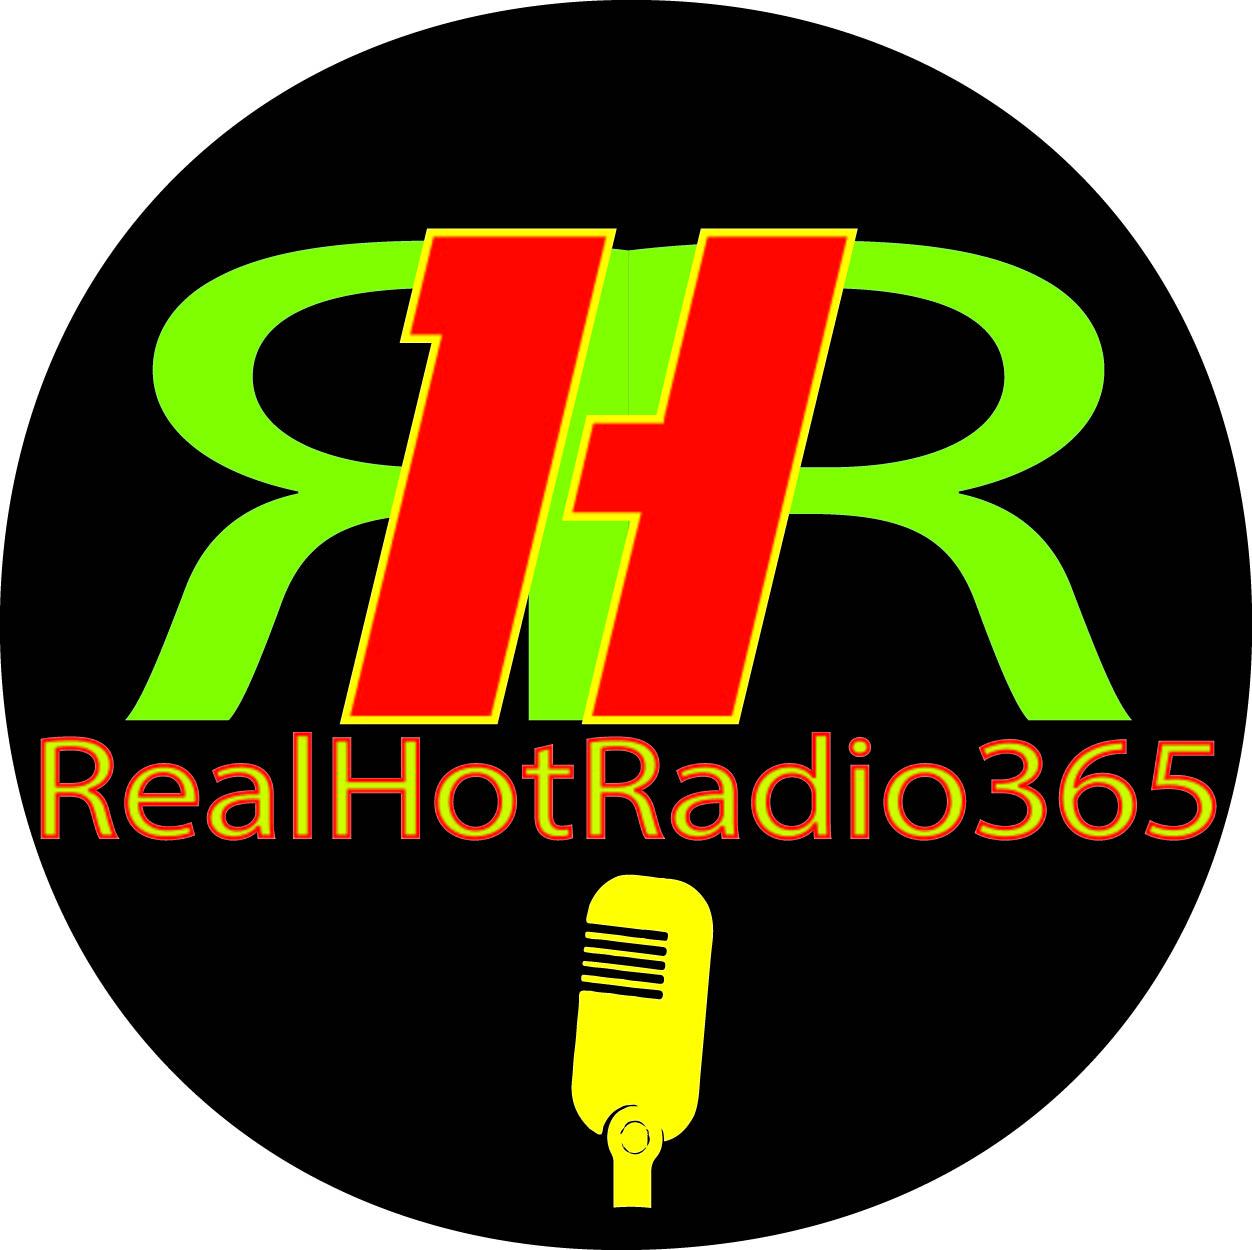 RealHotRadio365.com logo